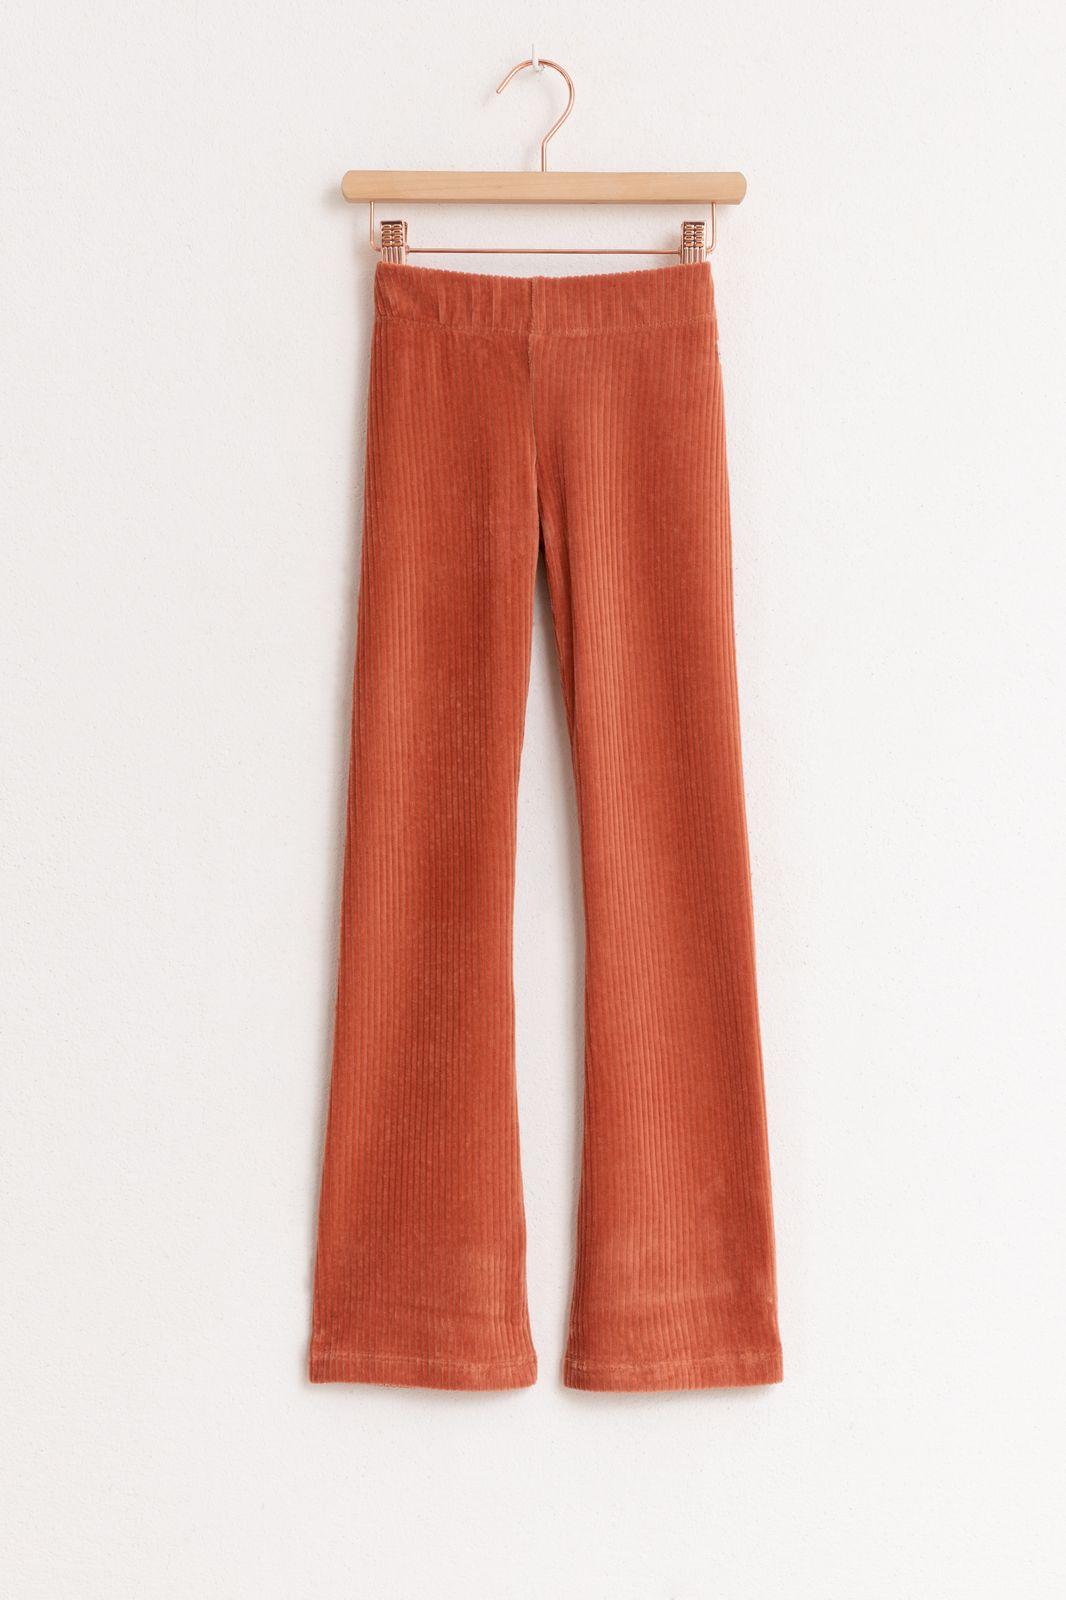 Roze/oranje rib flare legging - Kids | Sissy-Boy